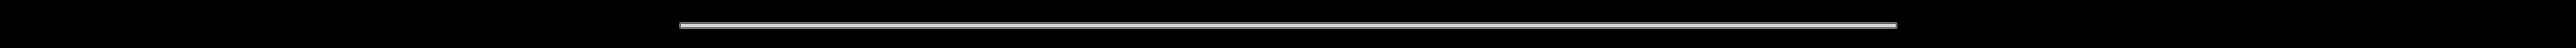 divider-small (4).png